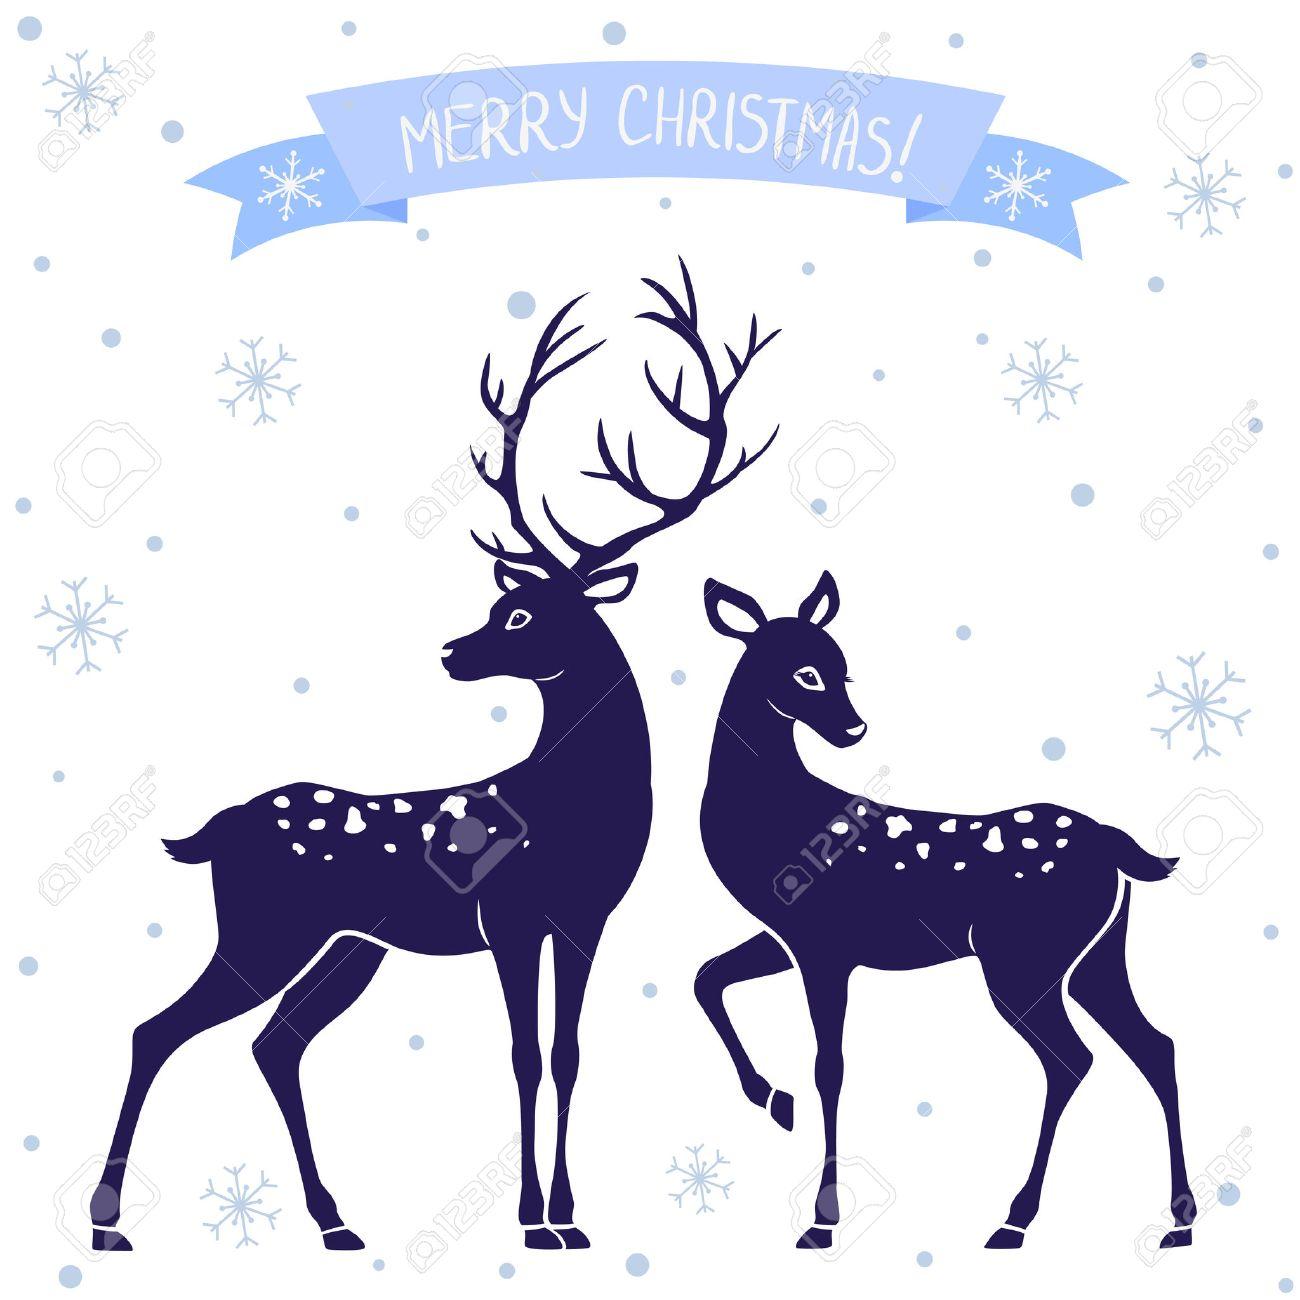 silhouettes of black and white illustration of two deer christmas rh 123rf com Deer Silhouette Vector Elk Vector